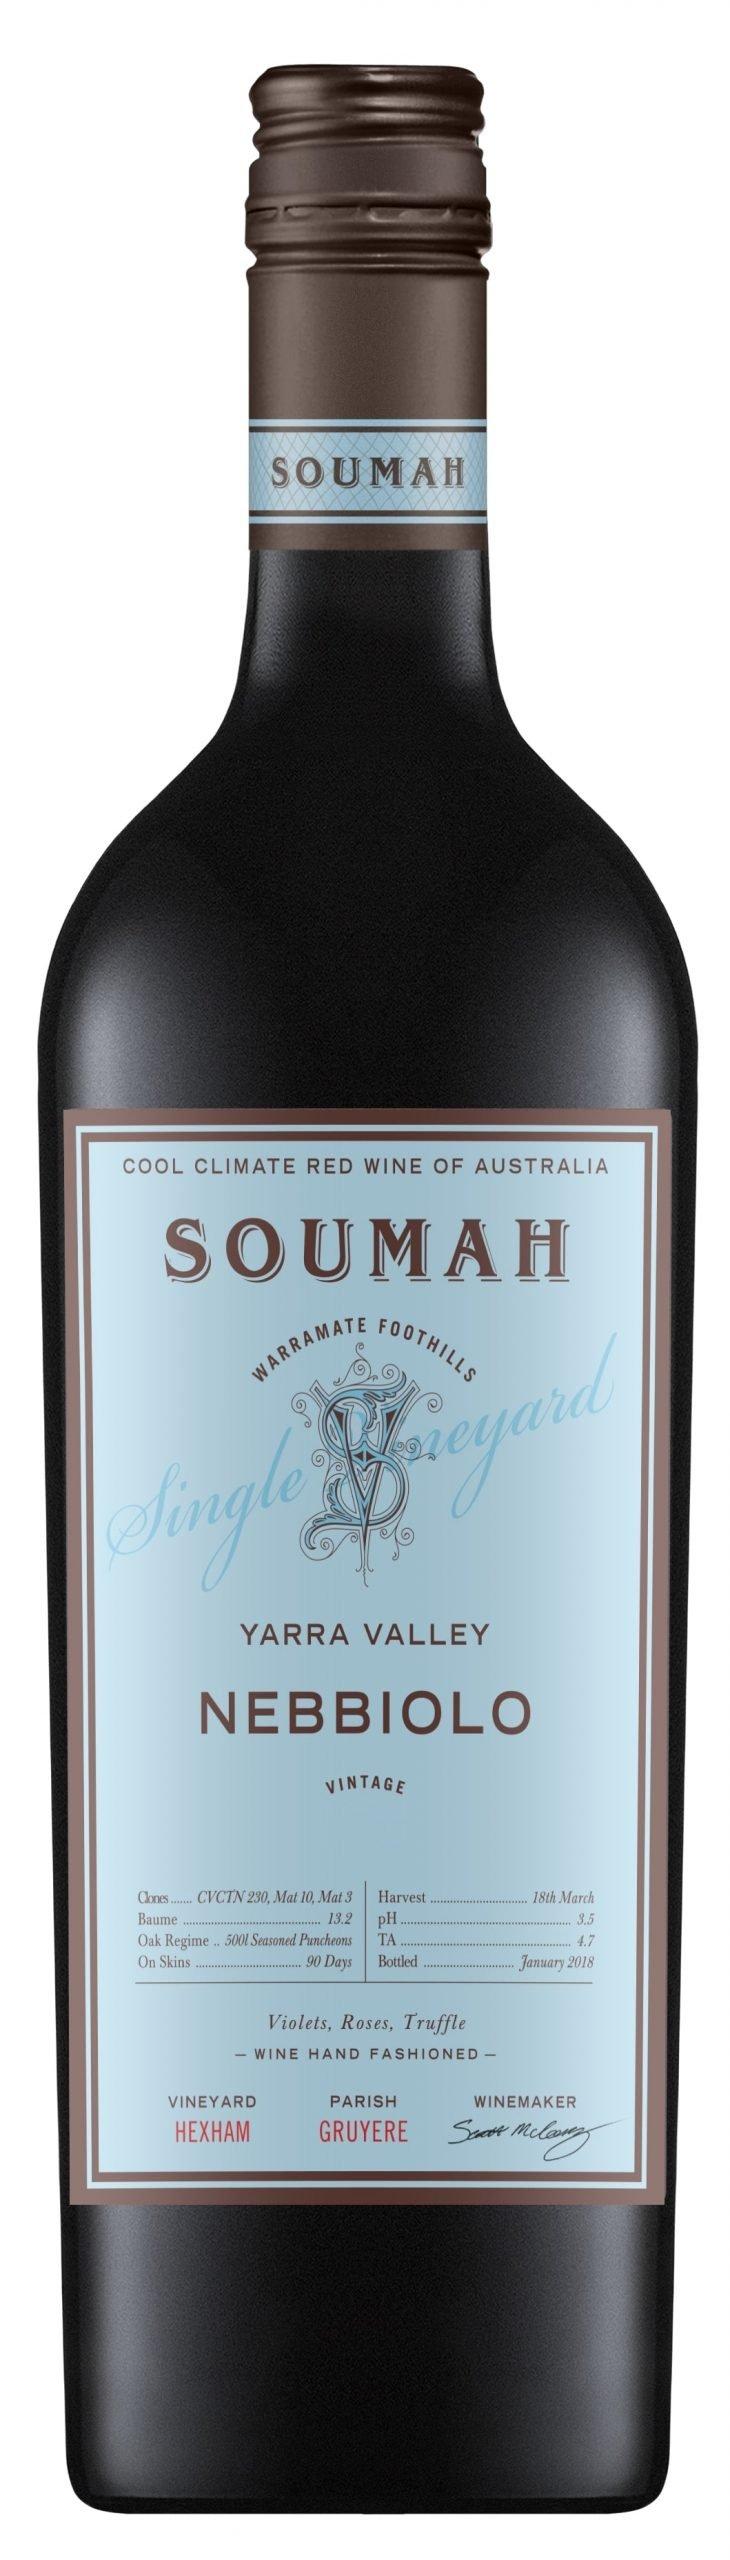 Soumah 'Hexam Vineyard' Nebbiolo 2016-0